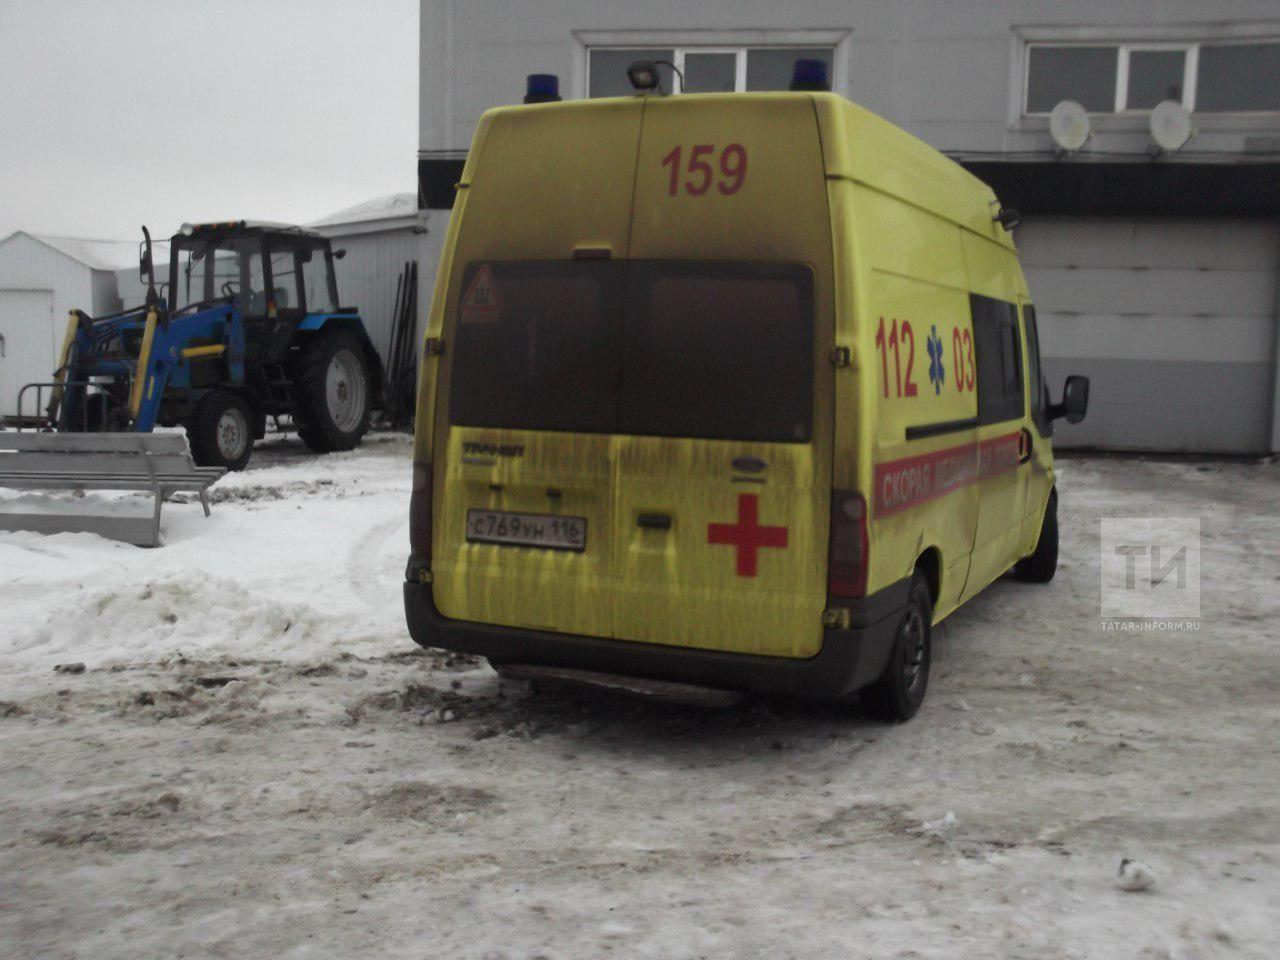 ВНабережных Челнах настройке железобетонная плита насмерть придавила 2-х мужчин